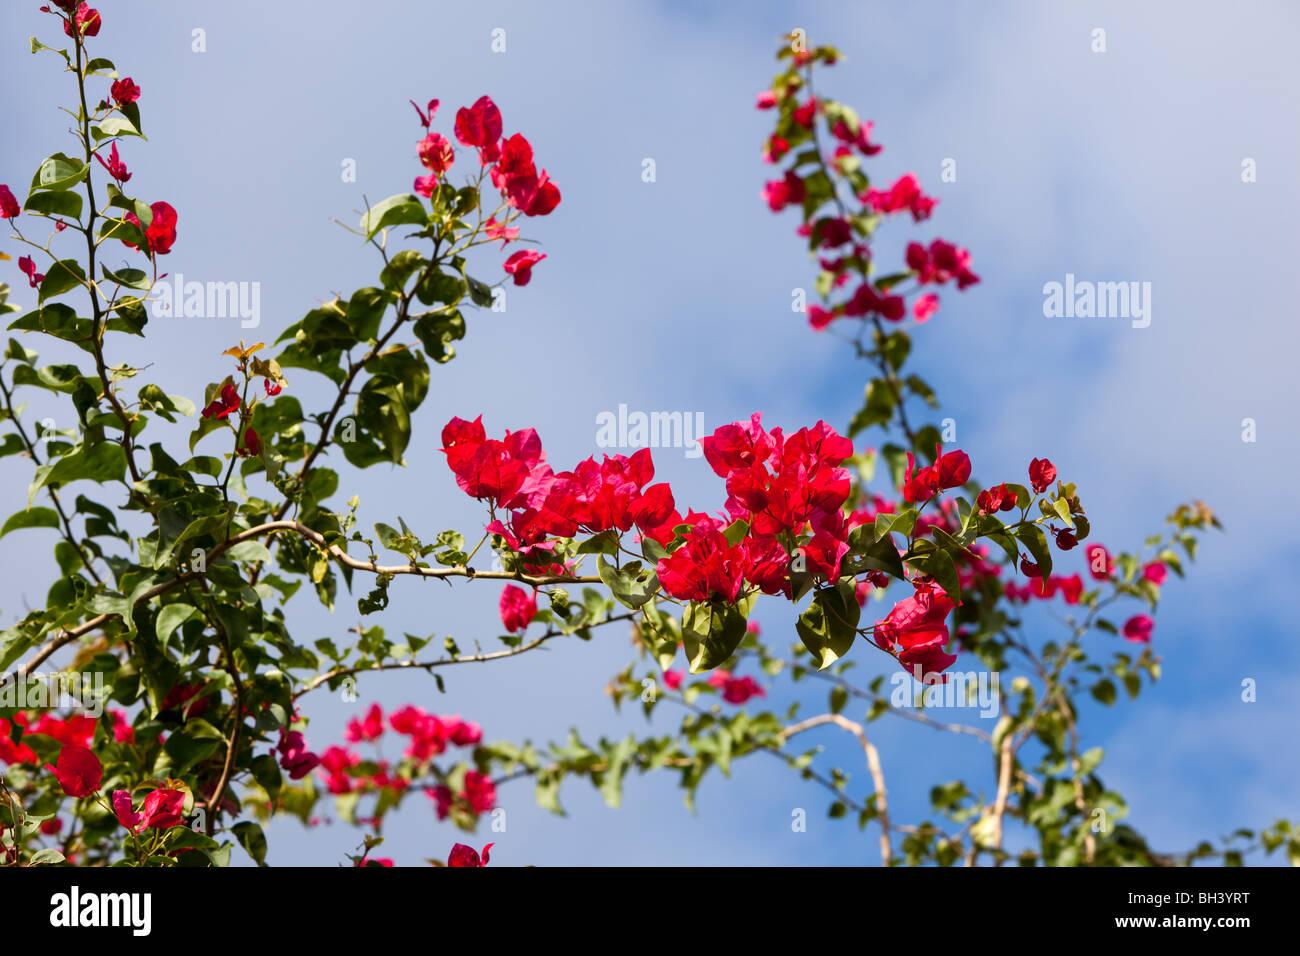 Bougainvilleas are popular ornamental plants. - Stock Image